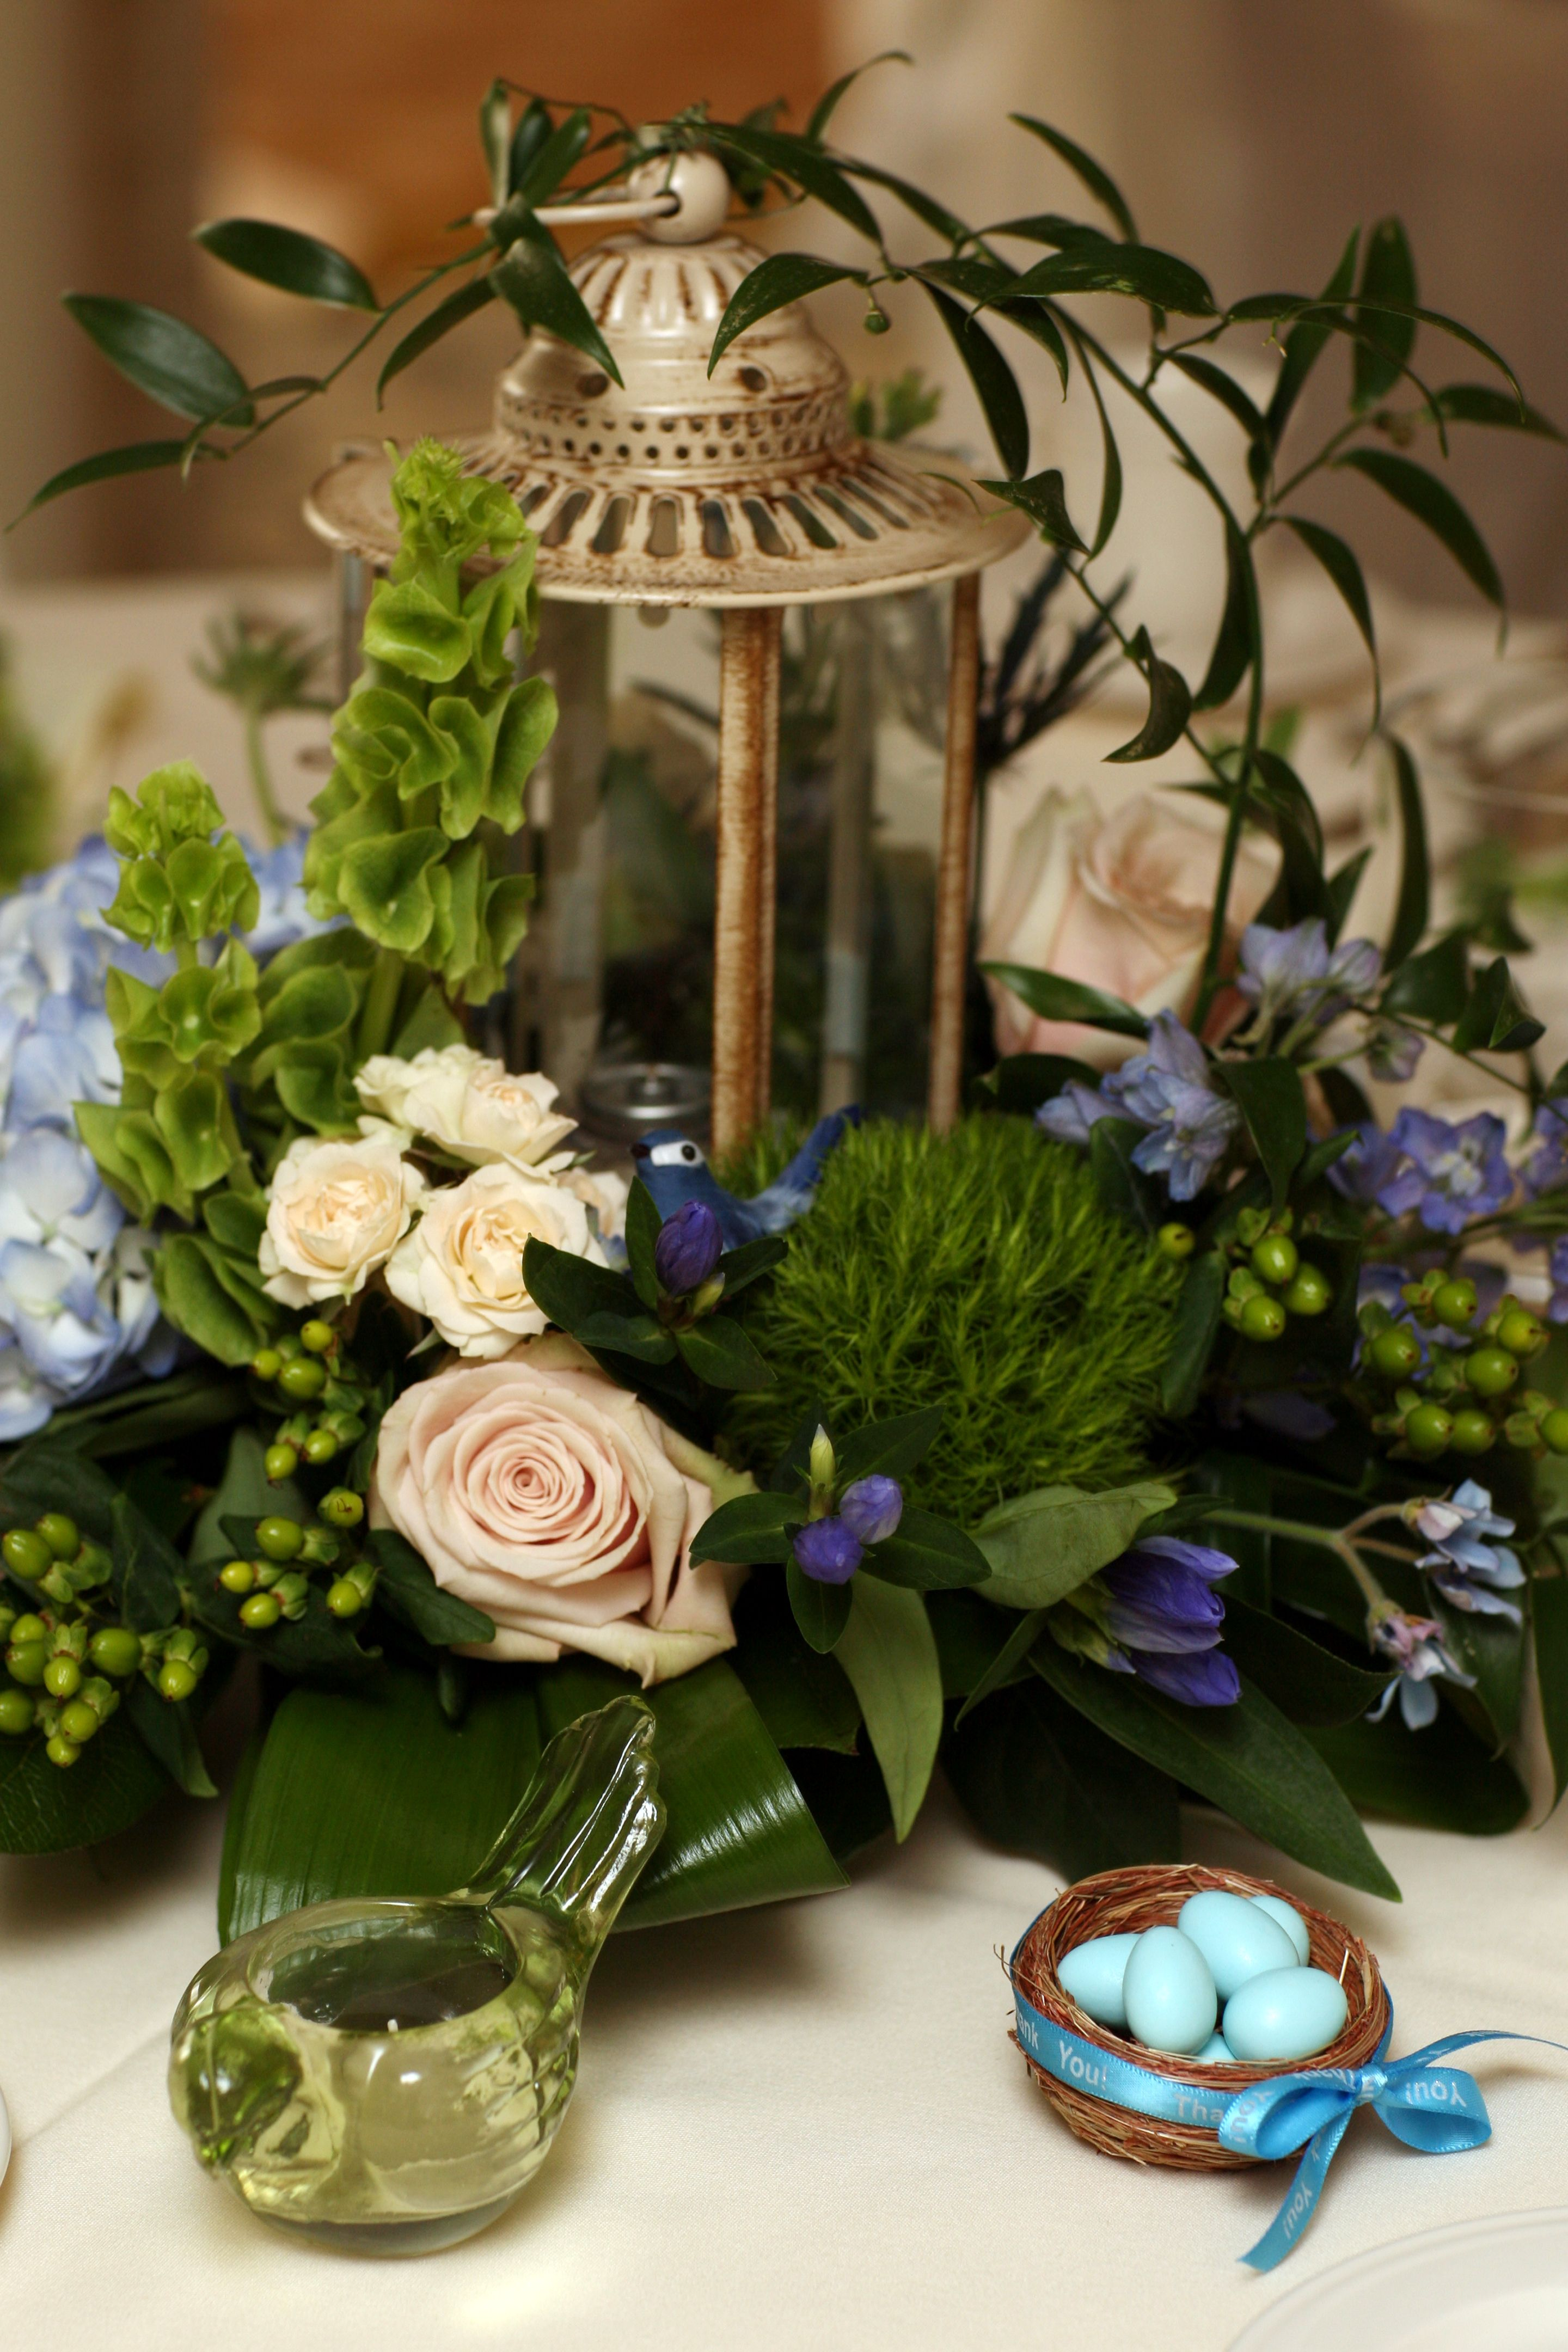 Wedding Centerpiece With A Garden Theme. Lantern, An Abundance Of Flowers  And Even A